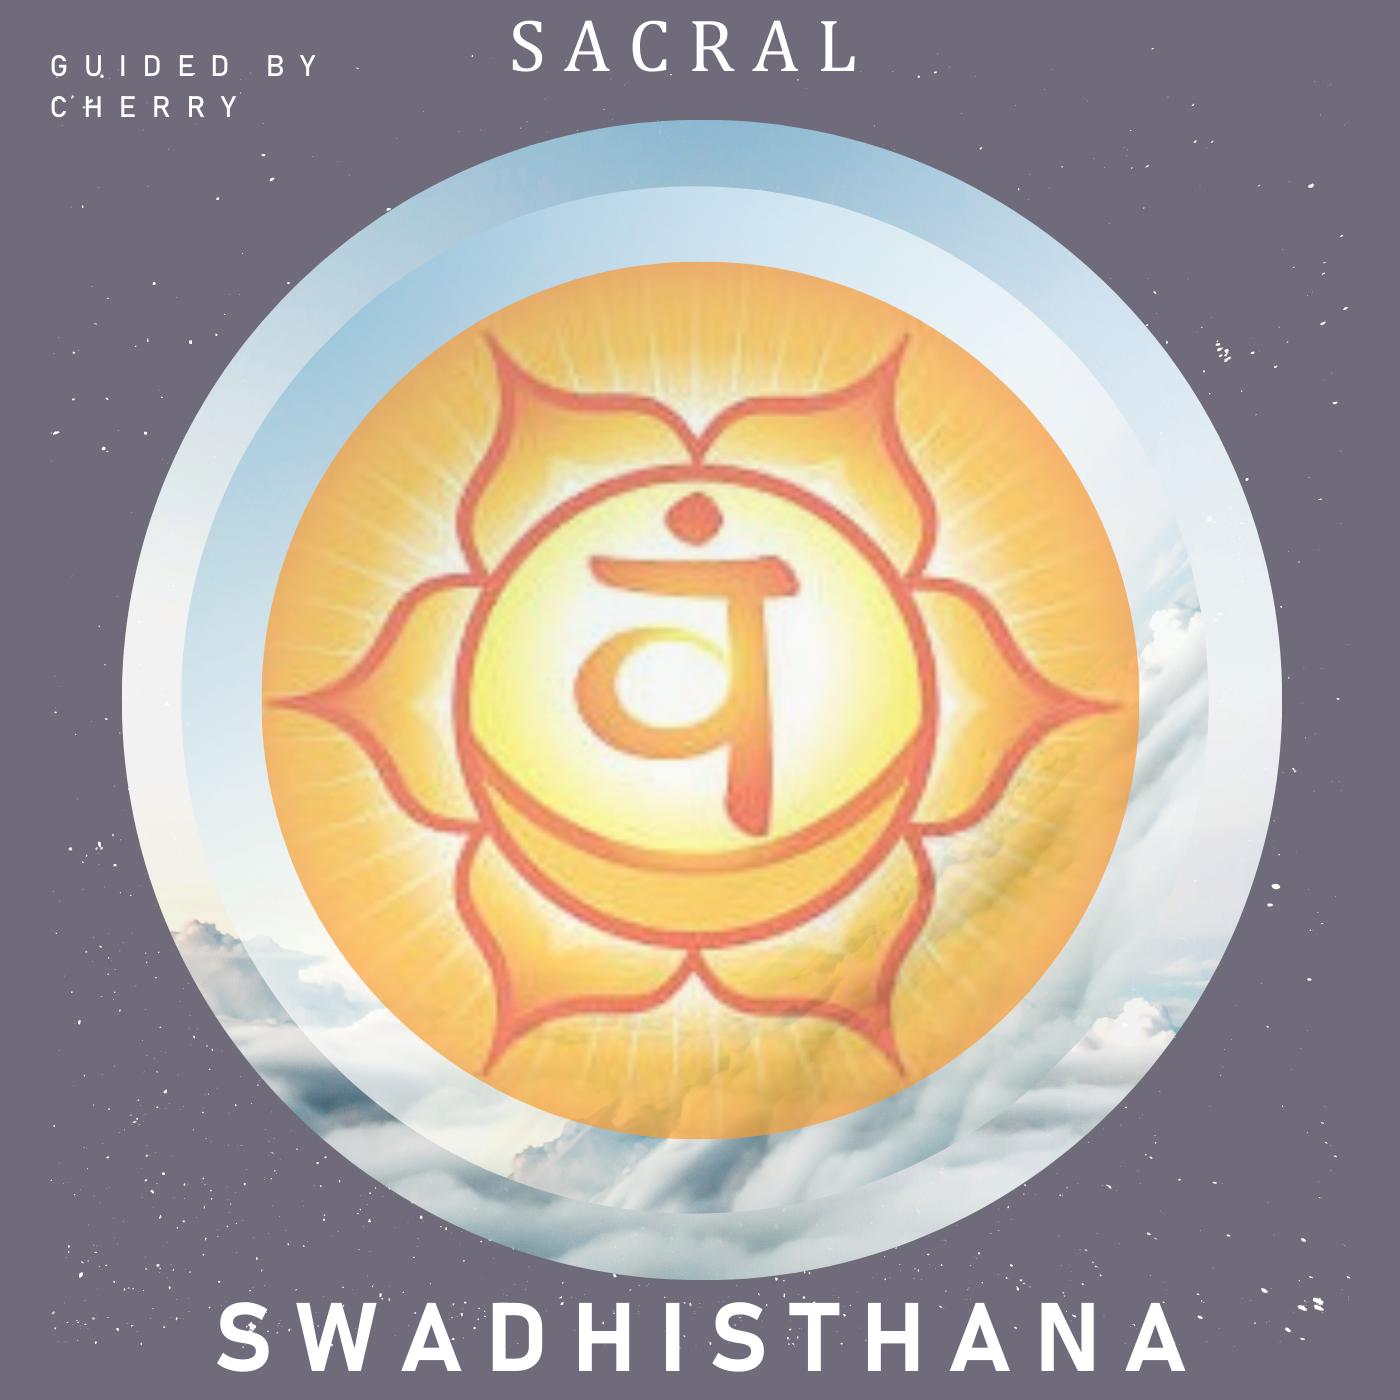 Sacral Chakra - Swadhisthana